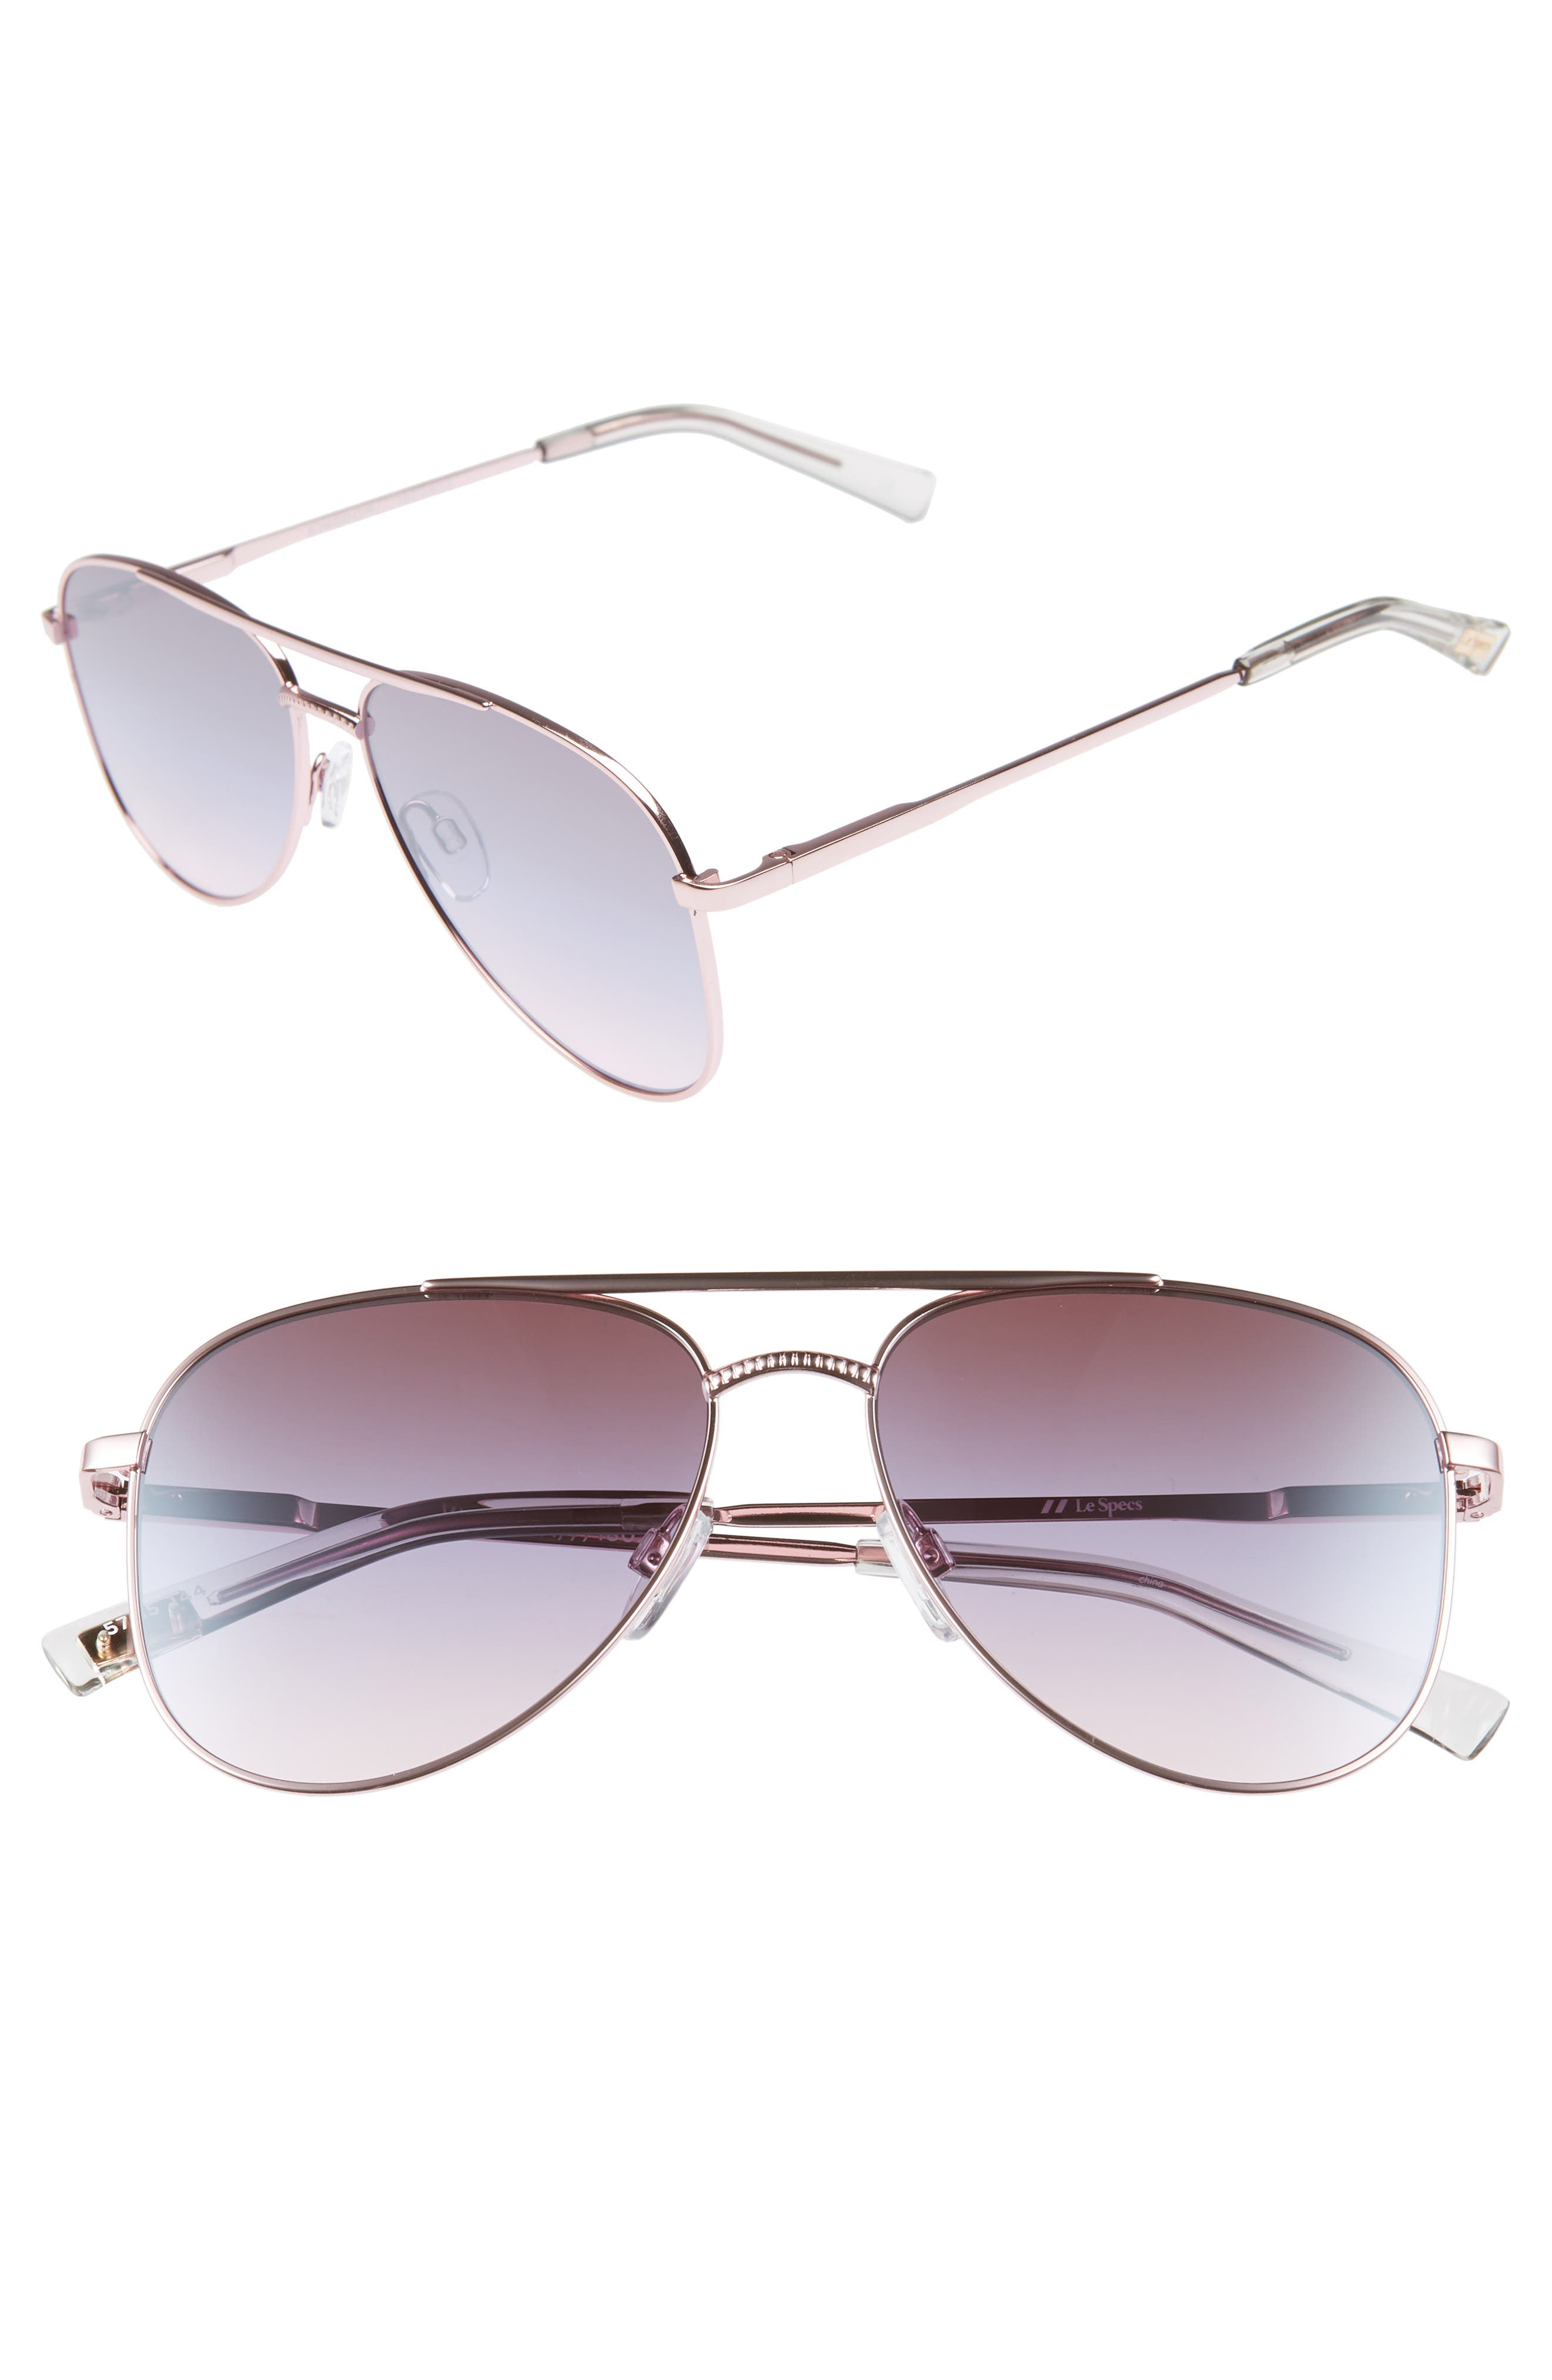 Kingdom 57mm Aviator Sunglasses,                         Main,                         color, ROSE GOLD